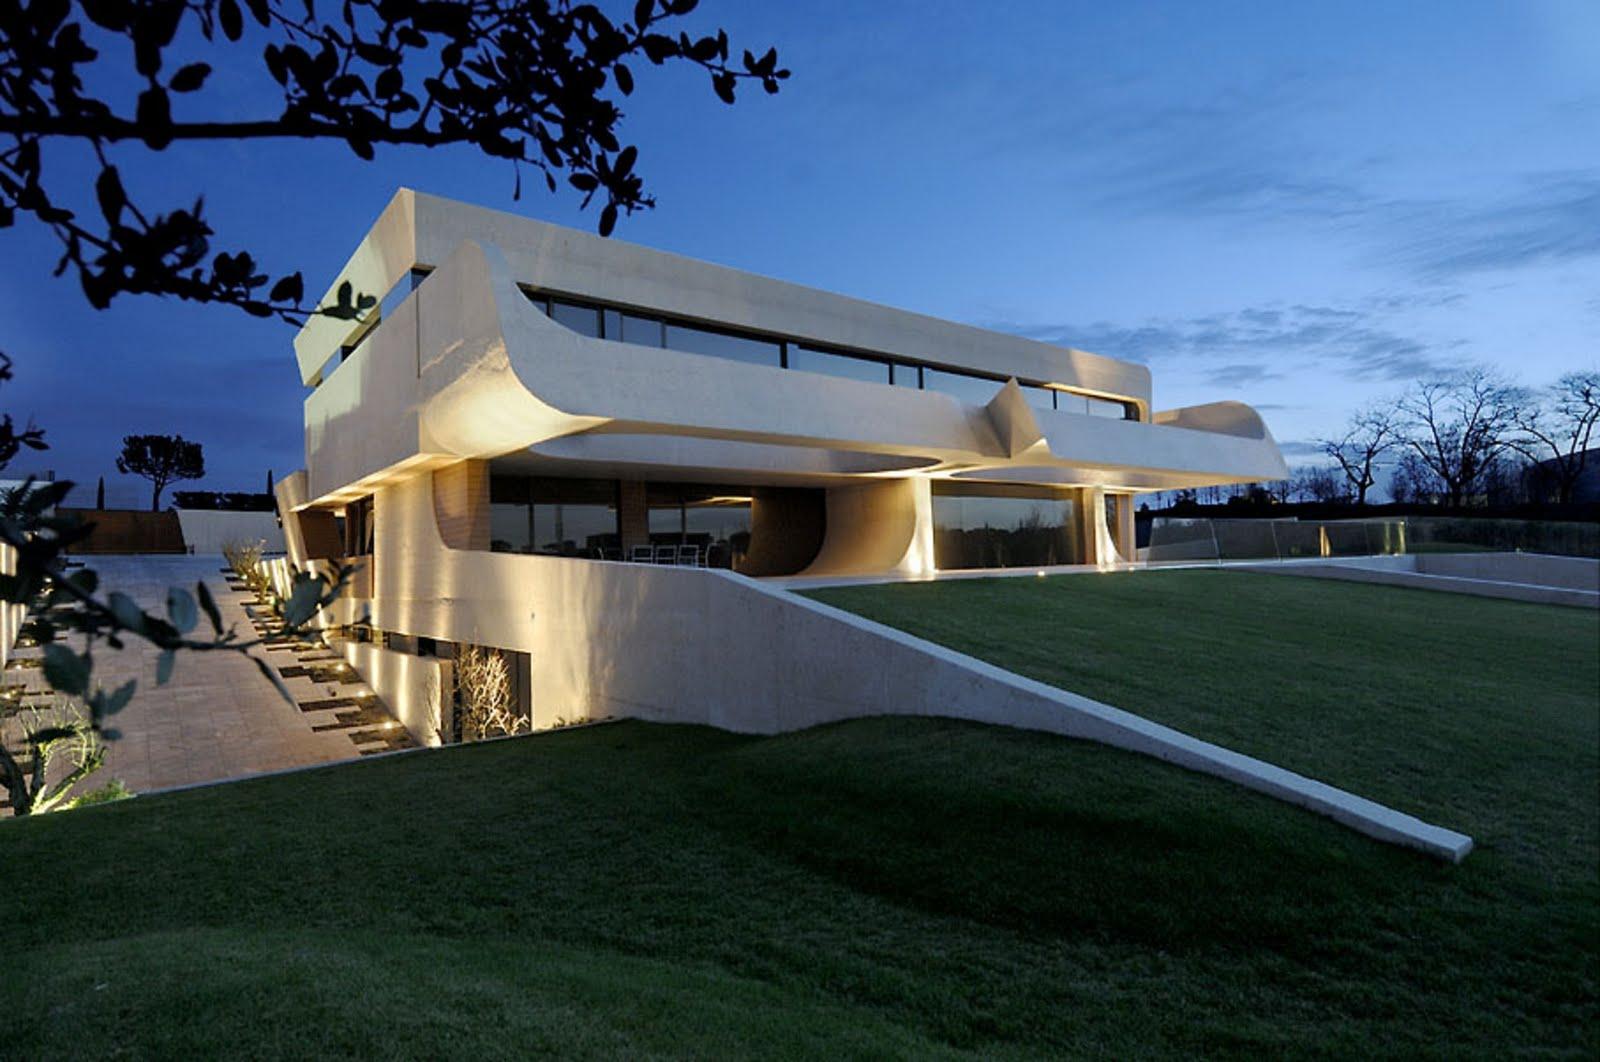 Arquitectura arquidea vivienda minimalista por a cero - Arquitectura de casas ...